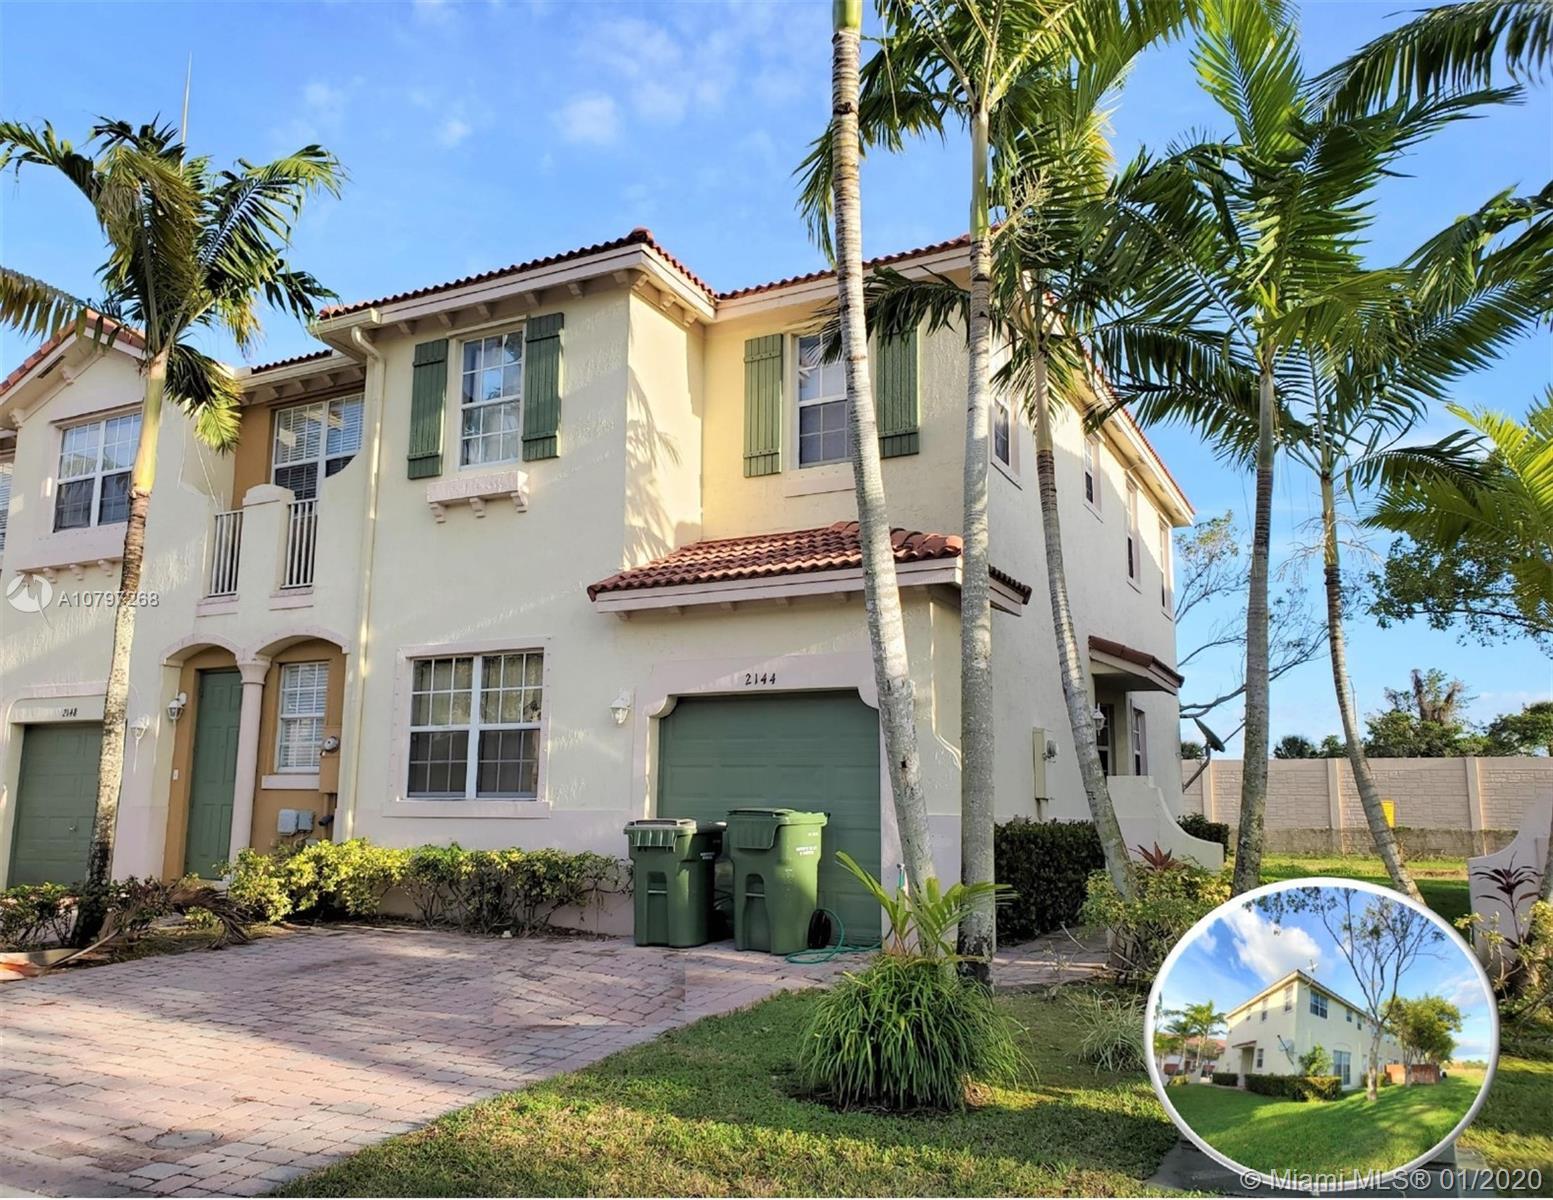 2144 NE 3 Ct #2144, Homestead, FL 33033 - Homestead, FL real estate listing